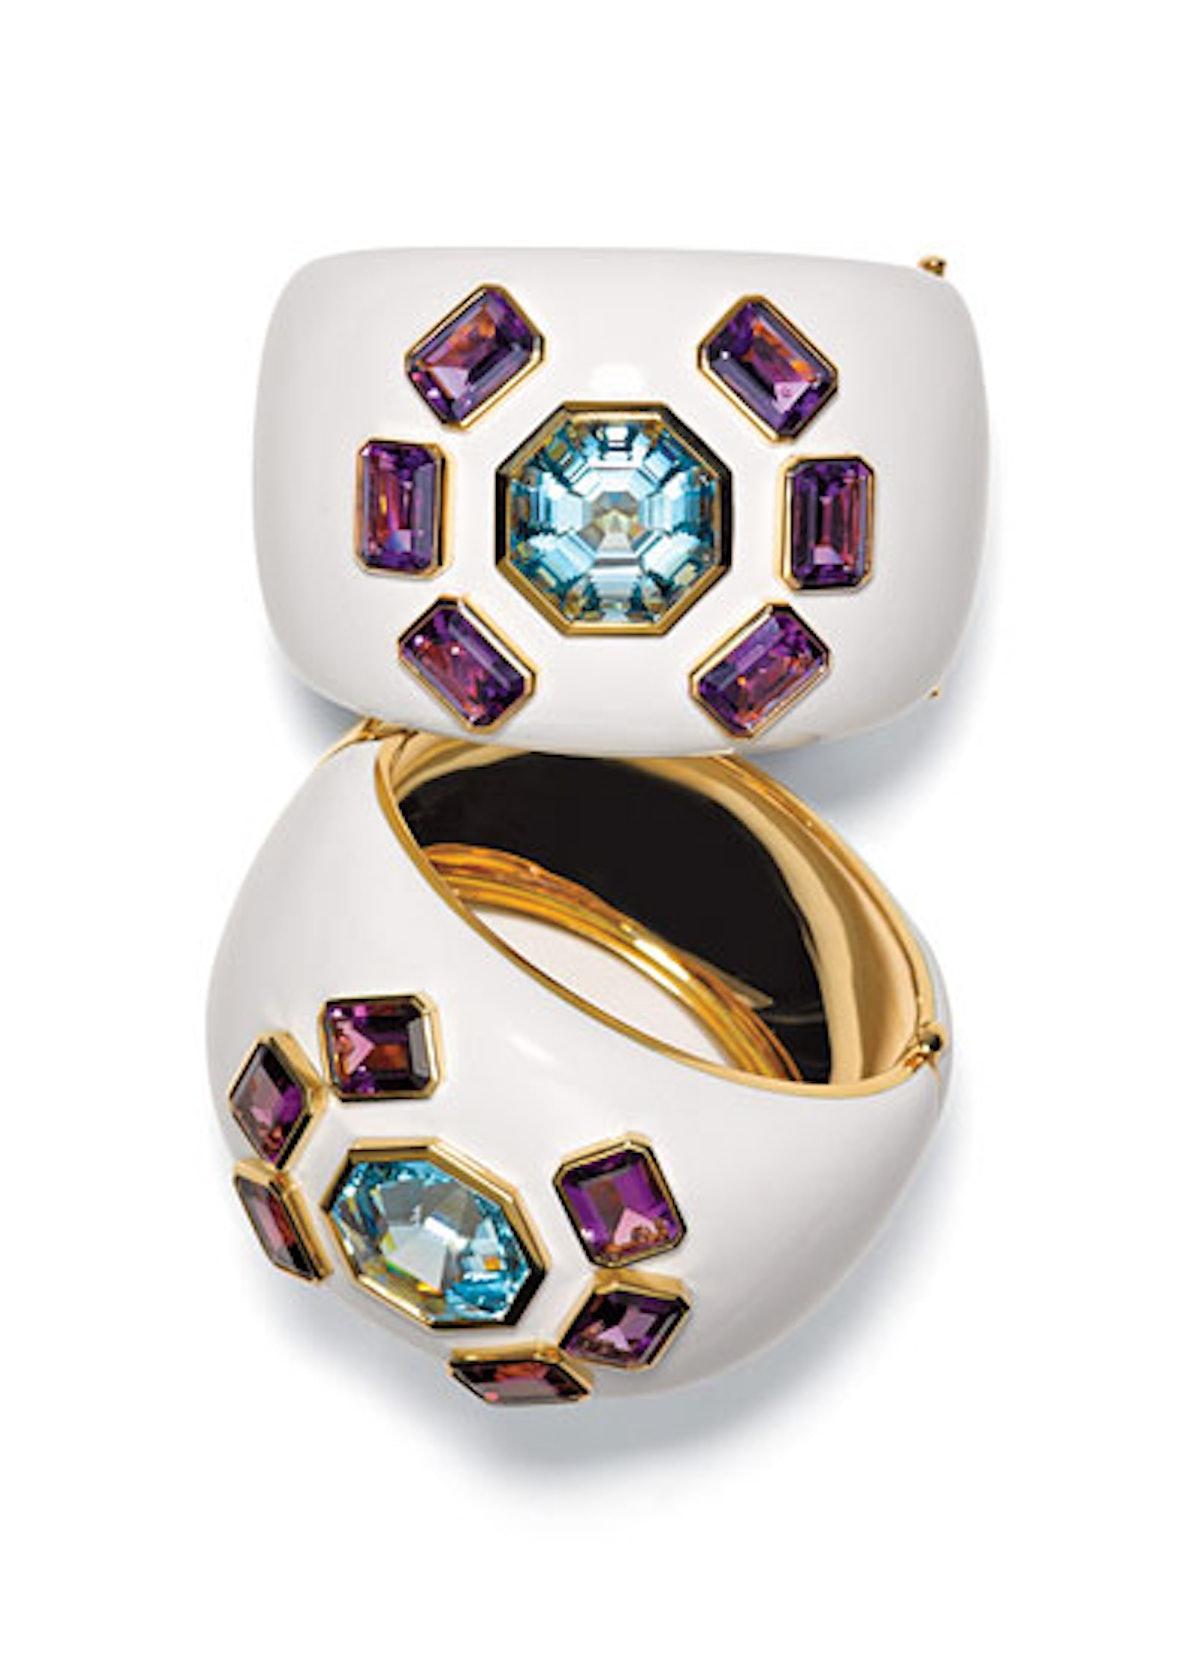 acss-claudia-jewelry-nov-2012-05-v.jpg